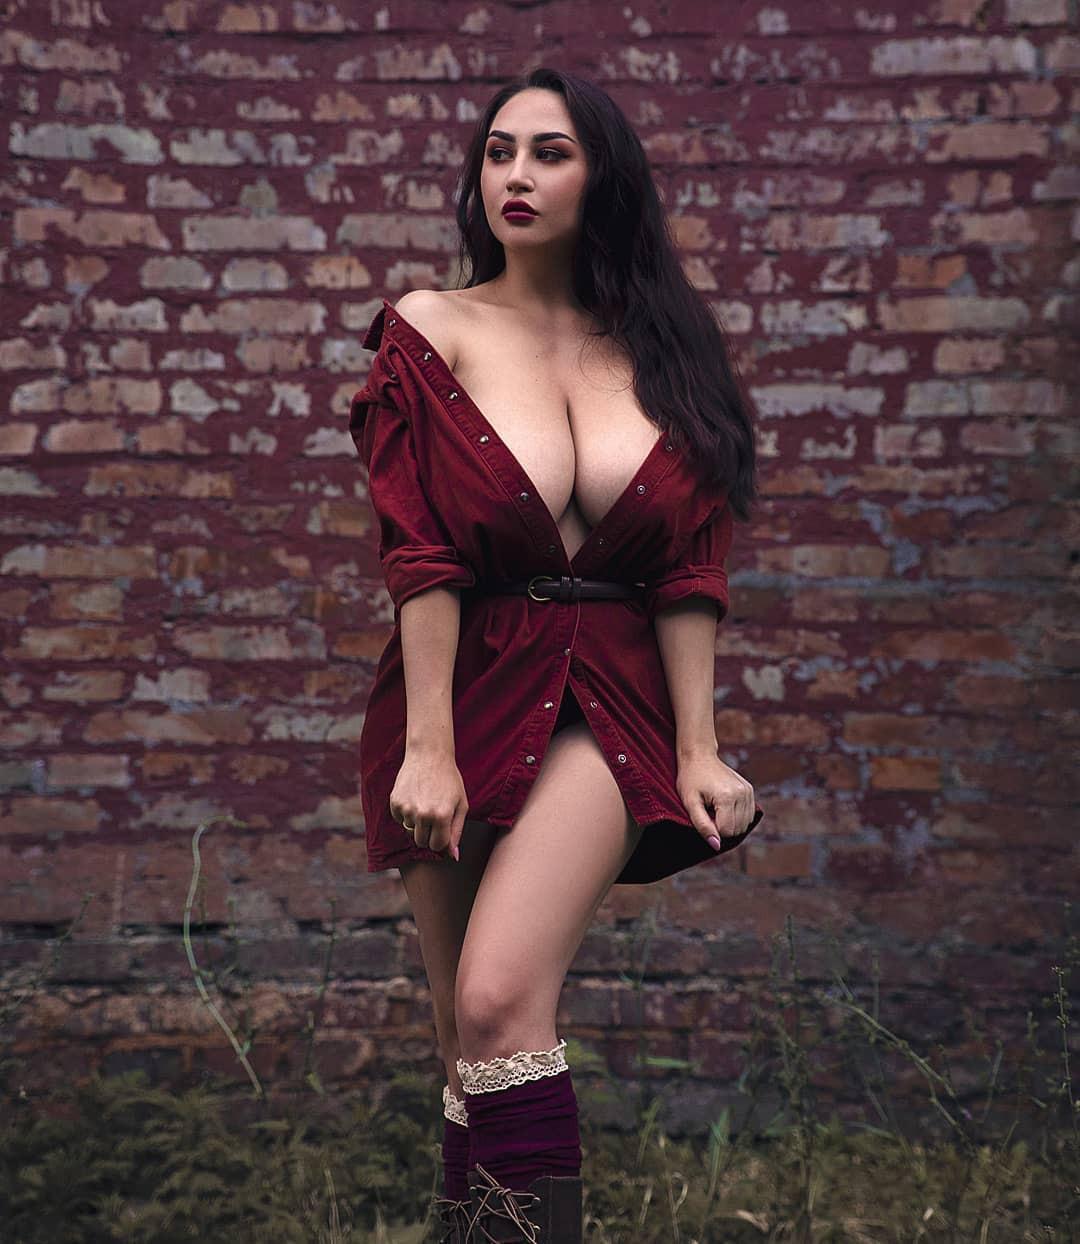 Louisa Khovanski photoshoot poses, thigh pics, hot legs picture